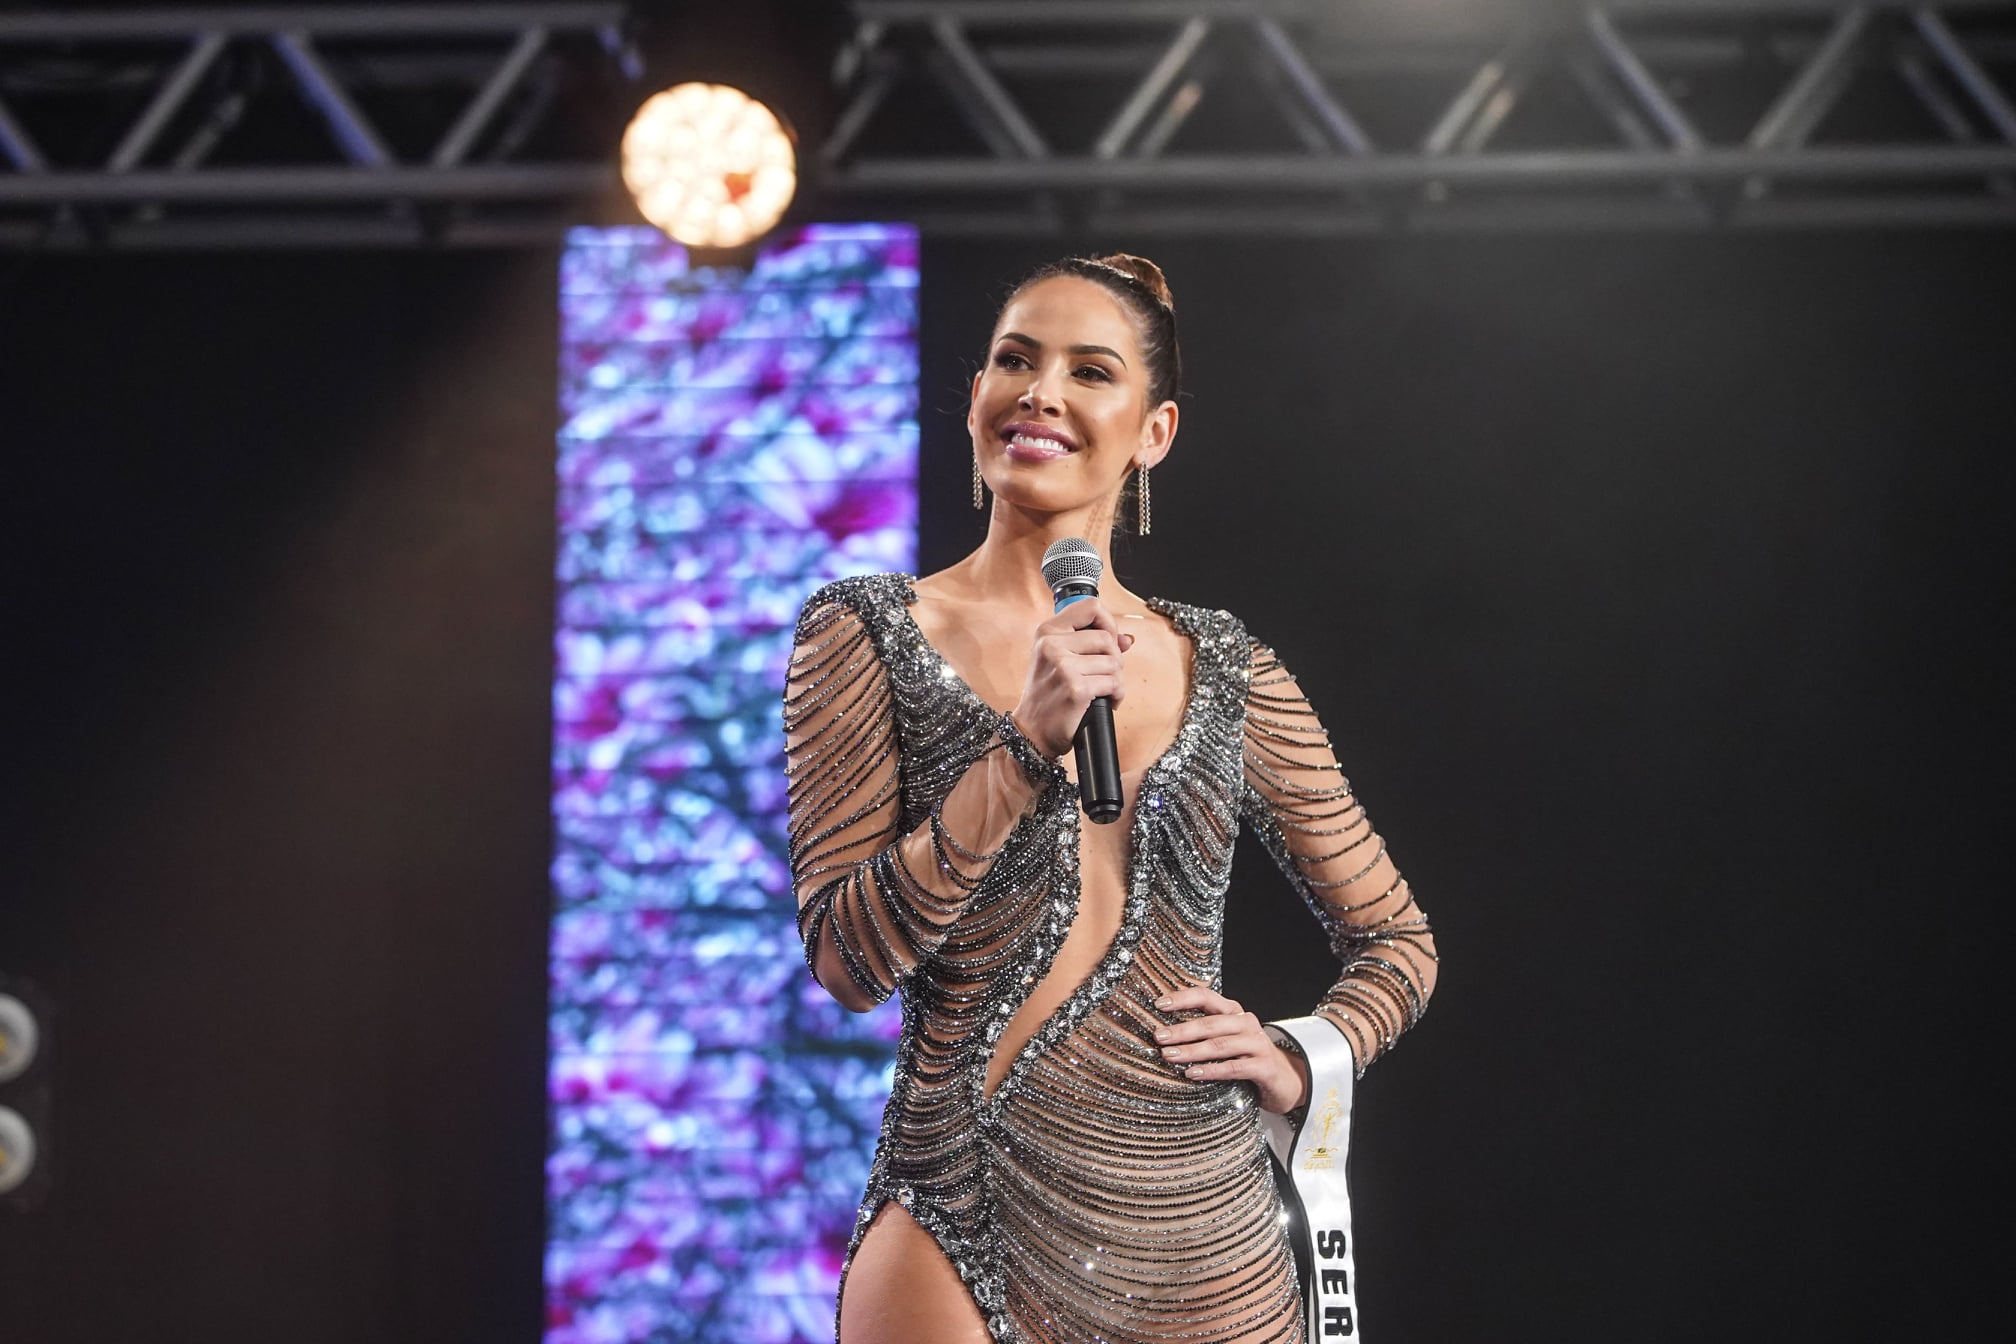 bruna zanardo, 1st runner-up de miss supranational brazil 2020/miss brasil internacional 2017/miss brasil terra 2016. - Página 19 12962210